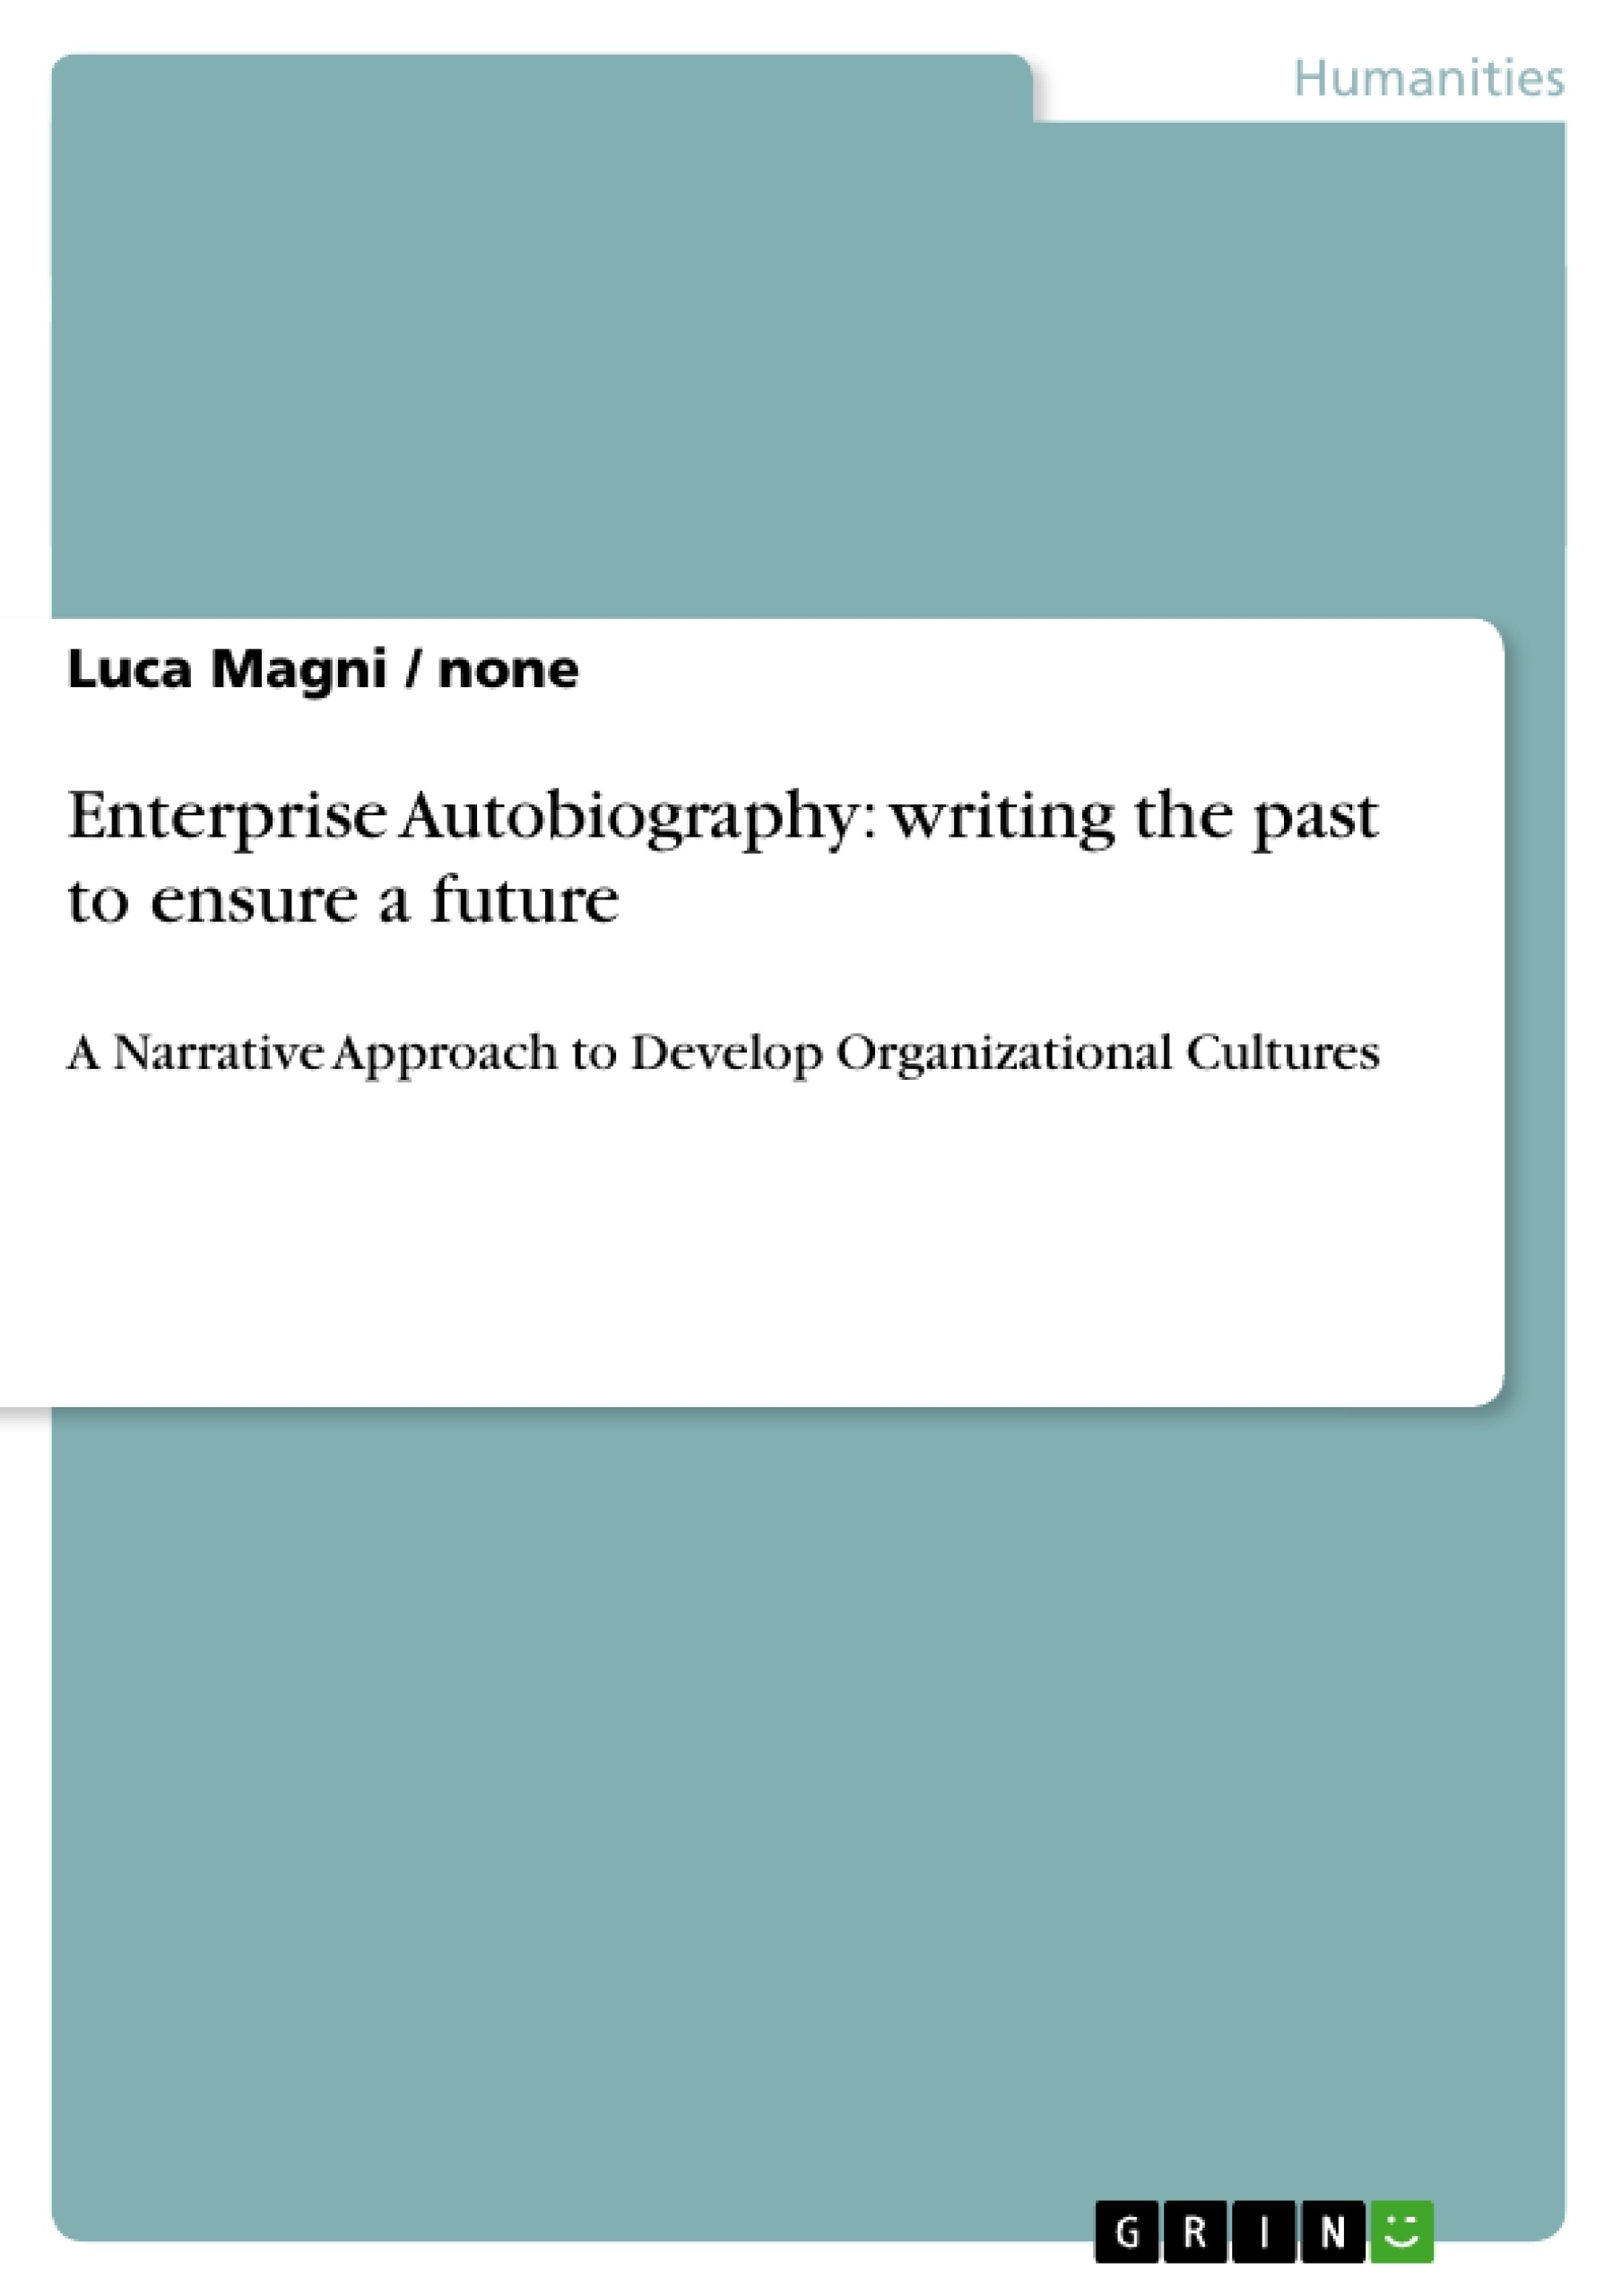 Title: Enterprise Autobiography: writing the past to ensure a future